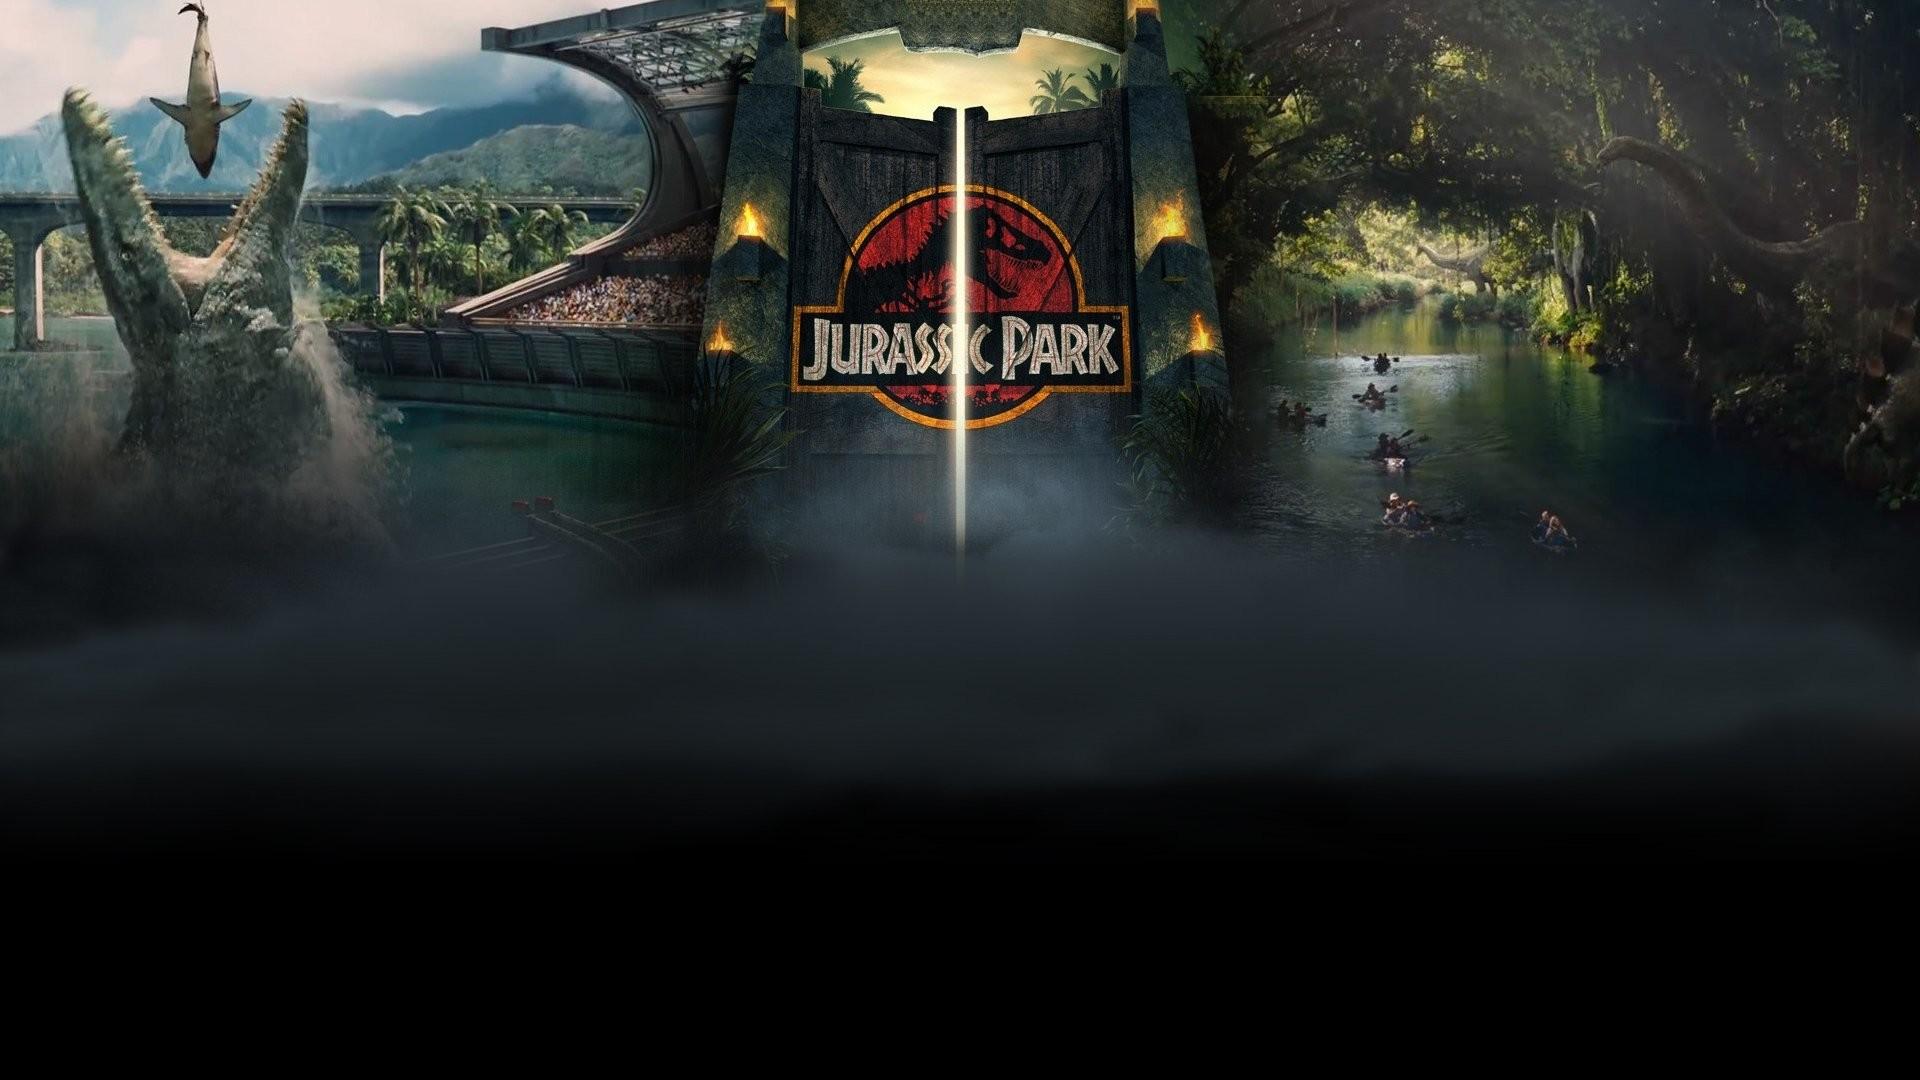 Jurassic World Wallpaper (73+ images)